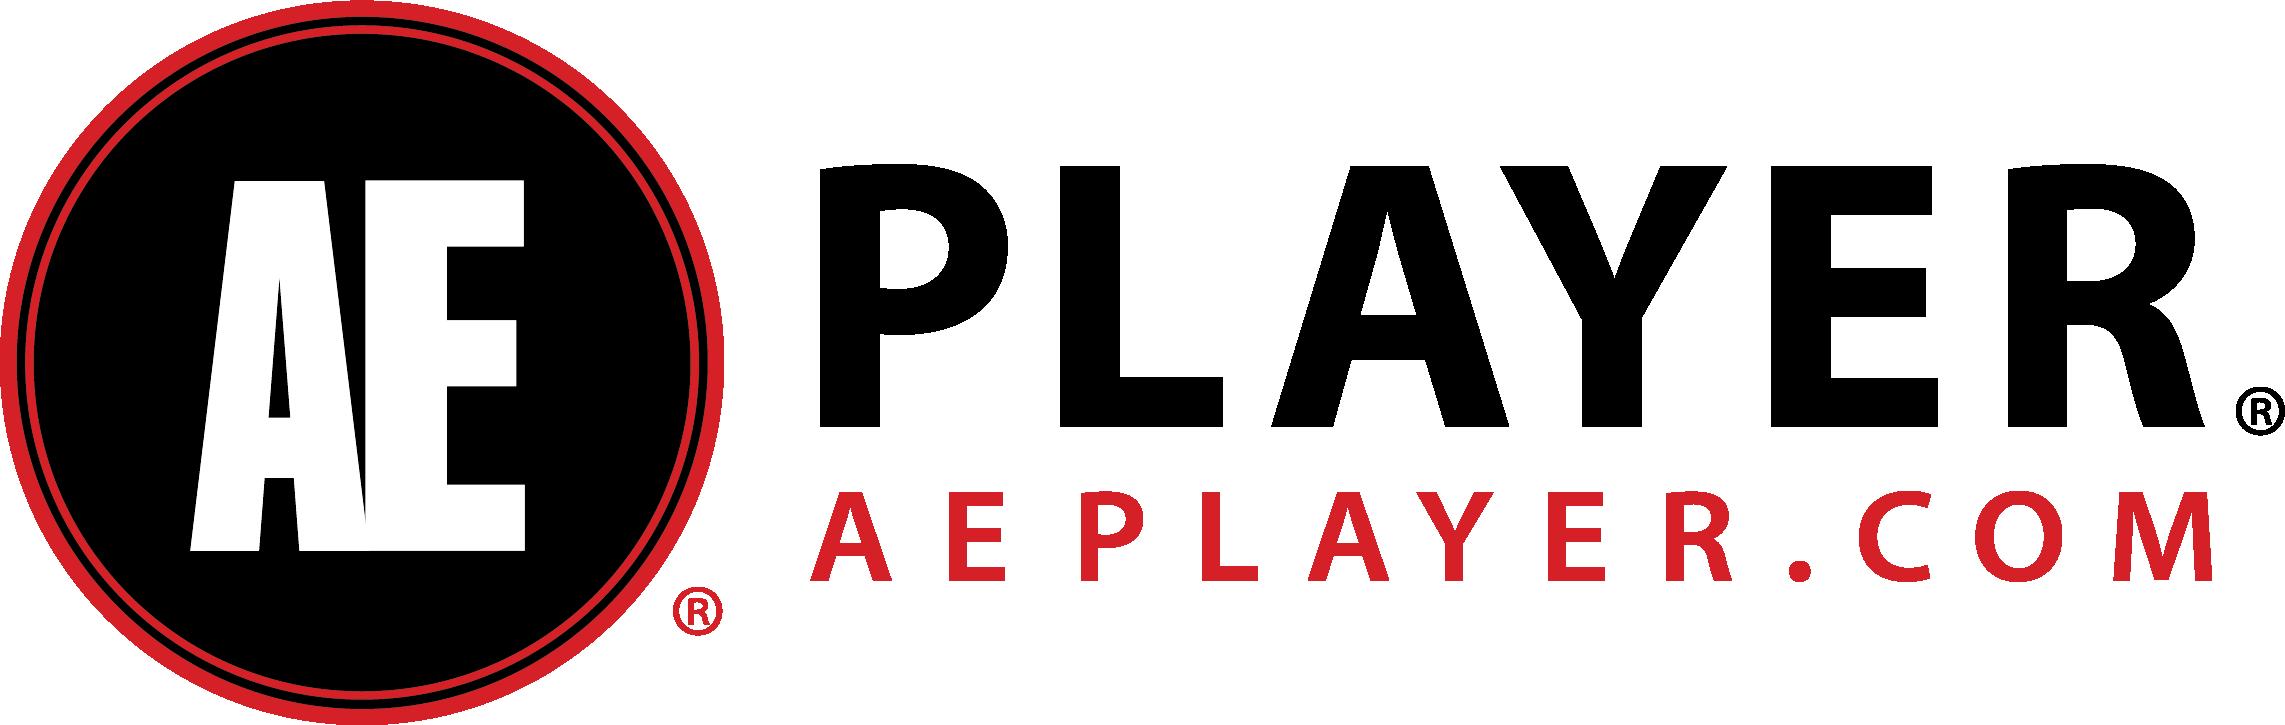 AE Player Logo_Landscape